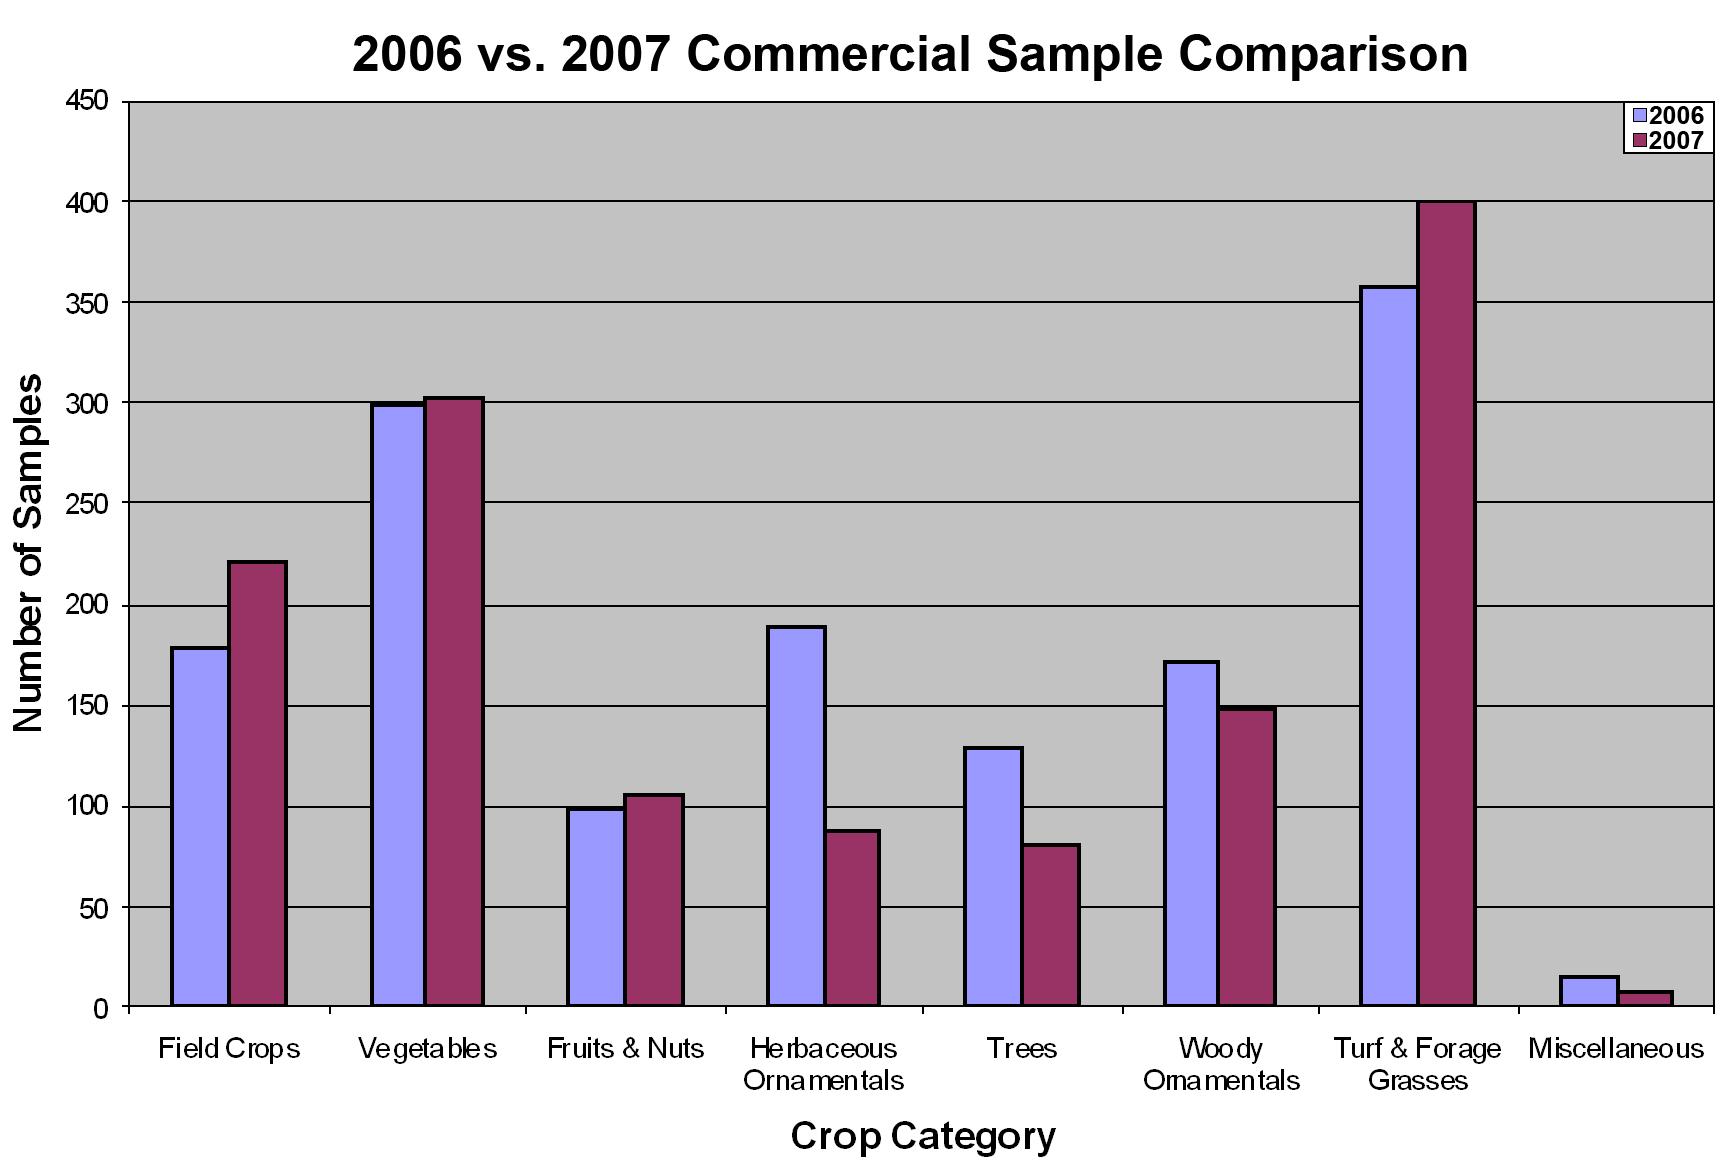 2006 vs. 2007 Commercial Sample Comparison